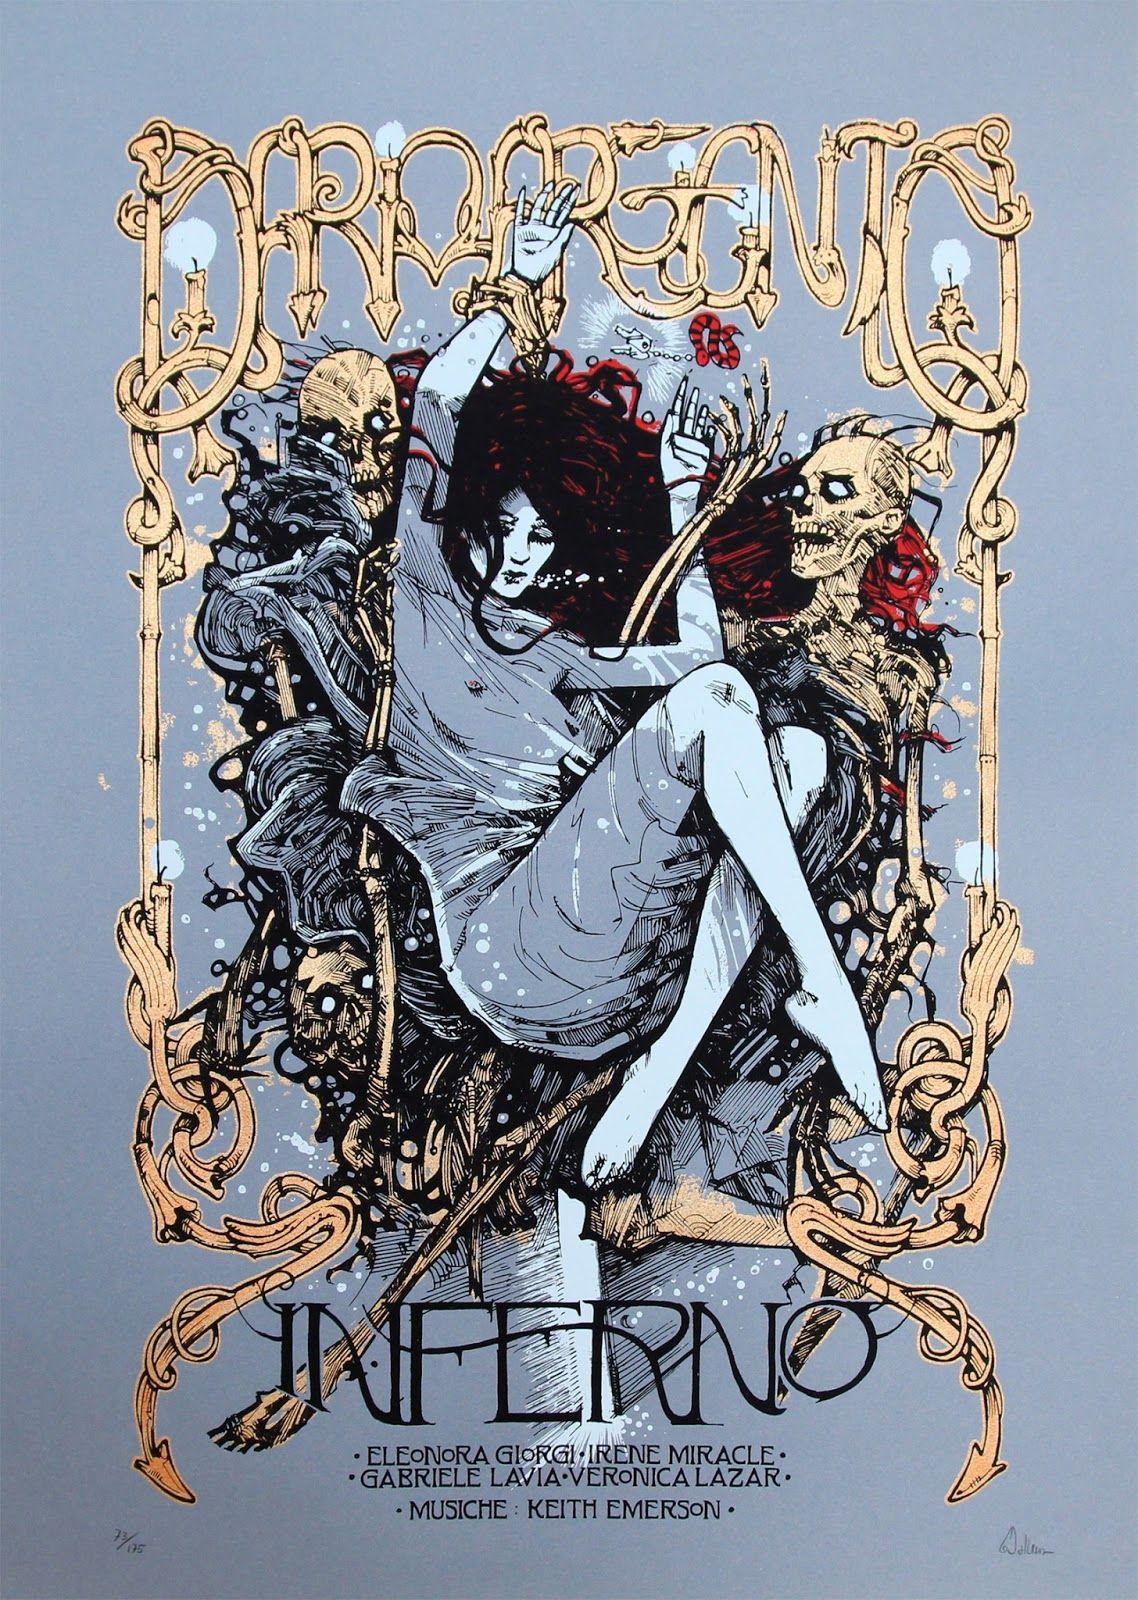 Inferno-Regular-Malleus-movie-inside-the-rock-poster-frame.jpg (1138×1600)